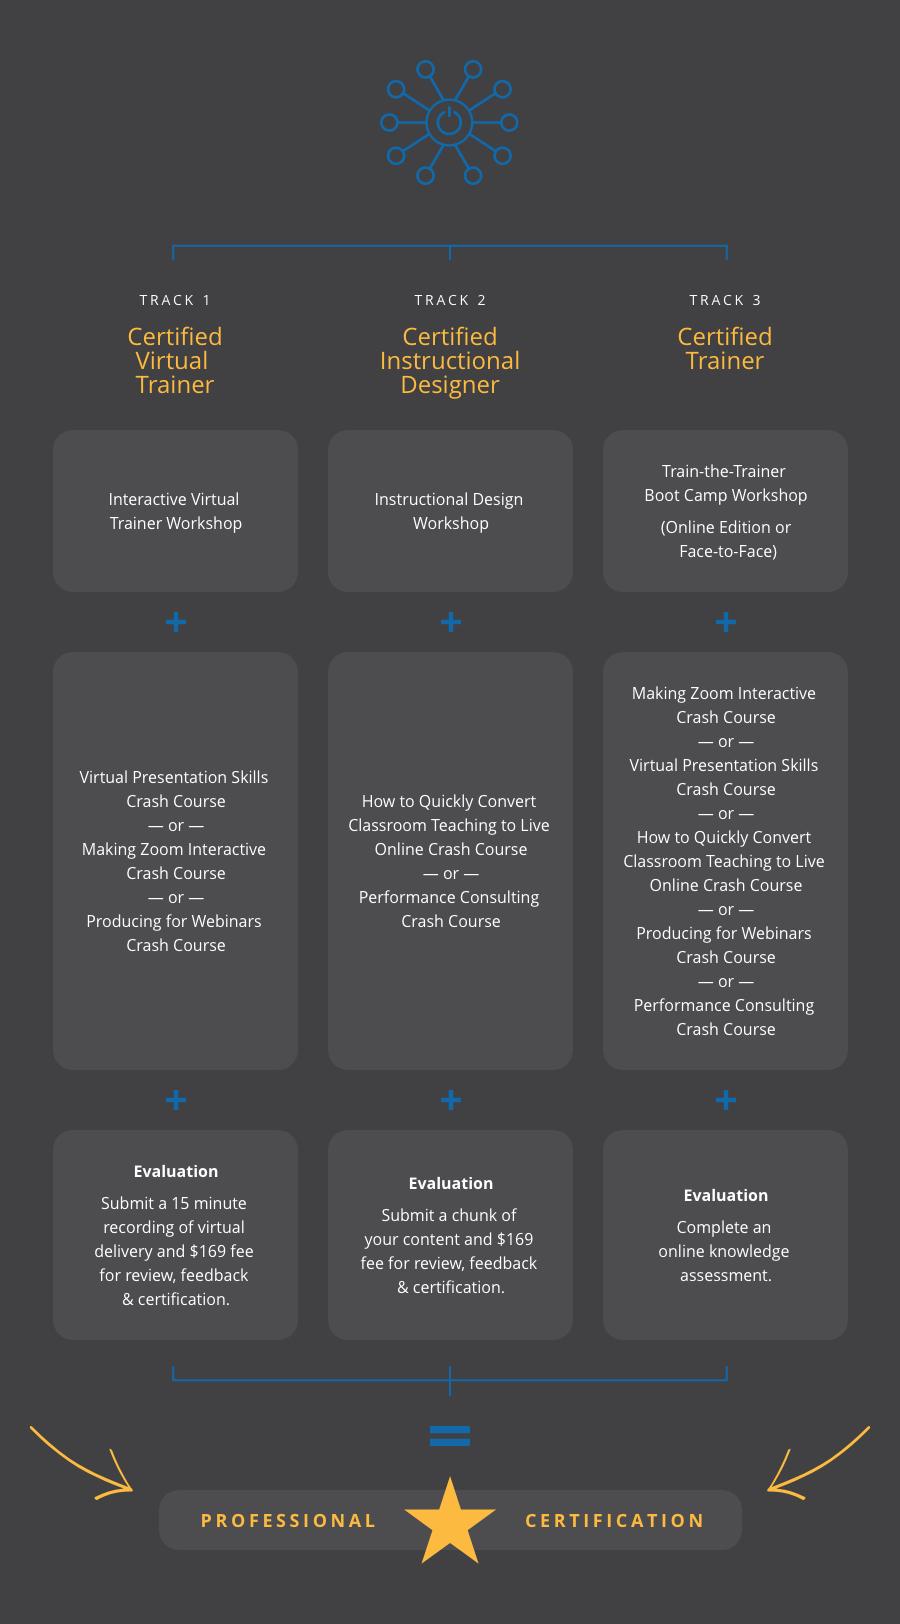 virtual-traininer-certification-graphic